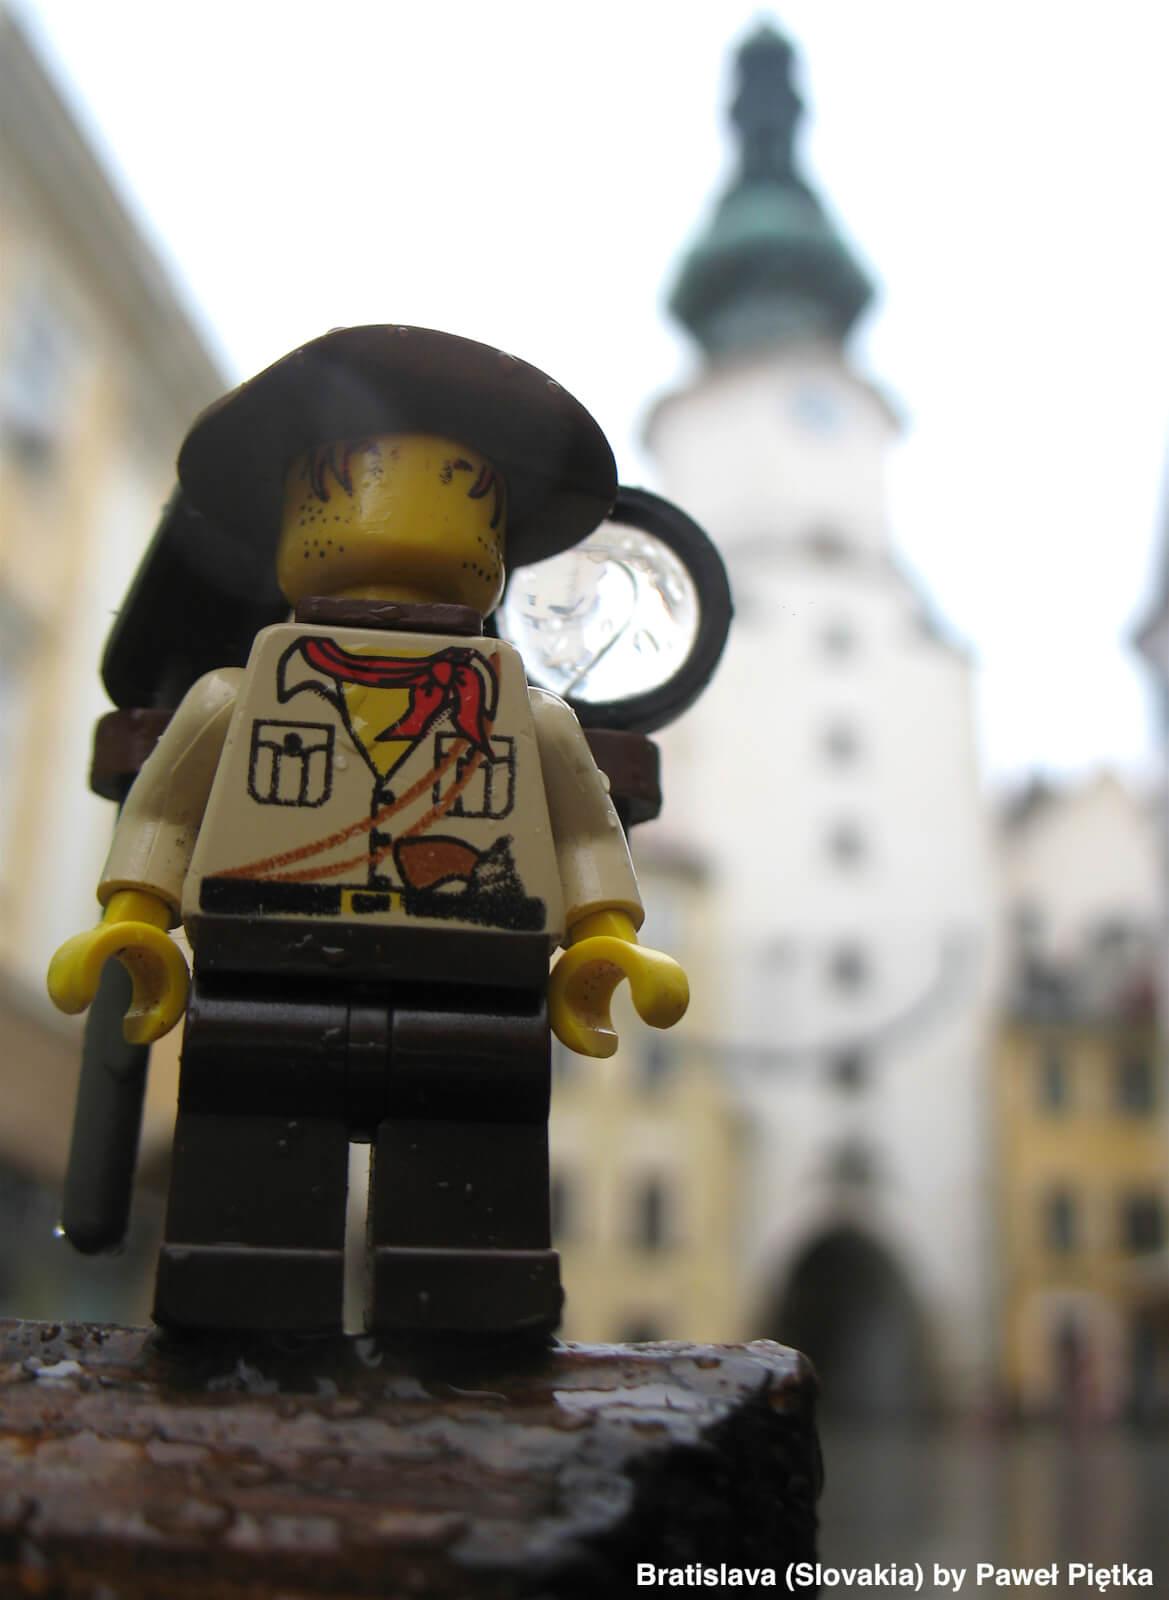 Bratislava (Slovakia) - Michael's Gate